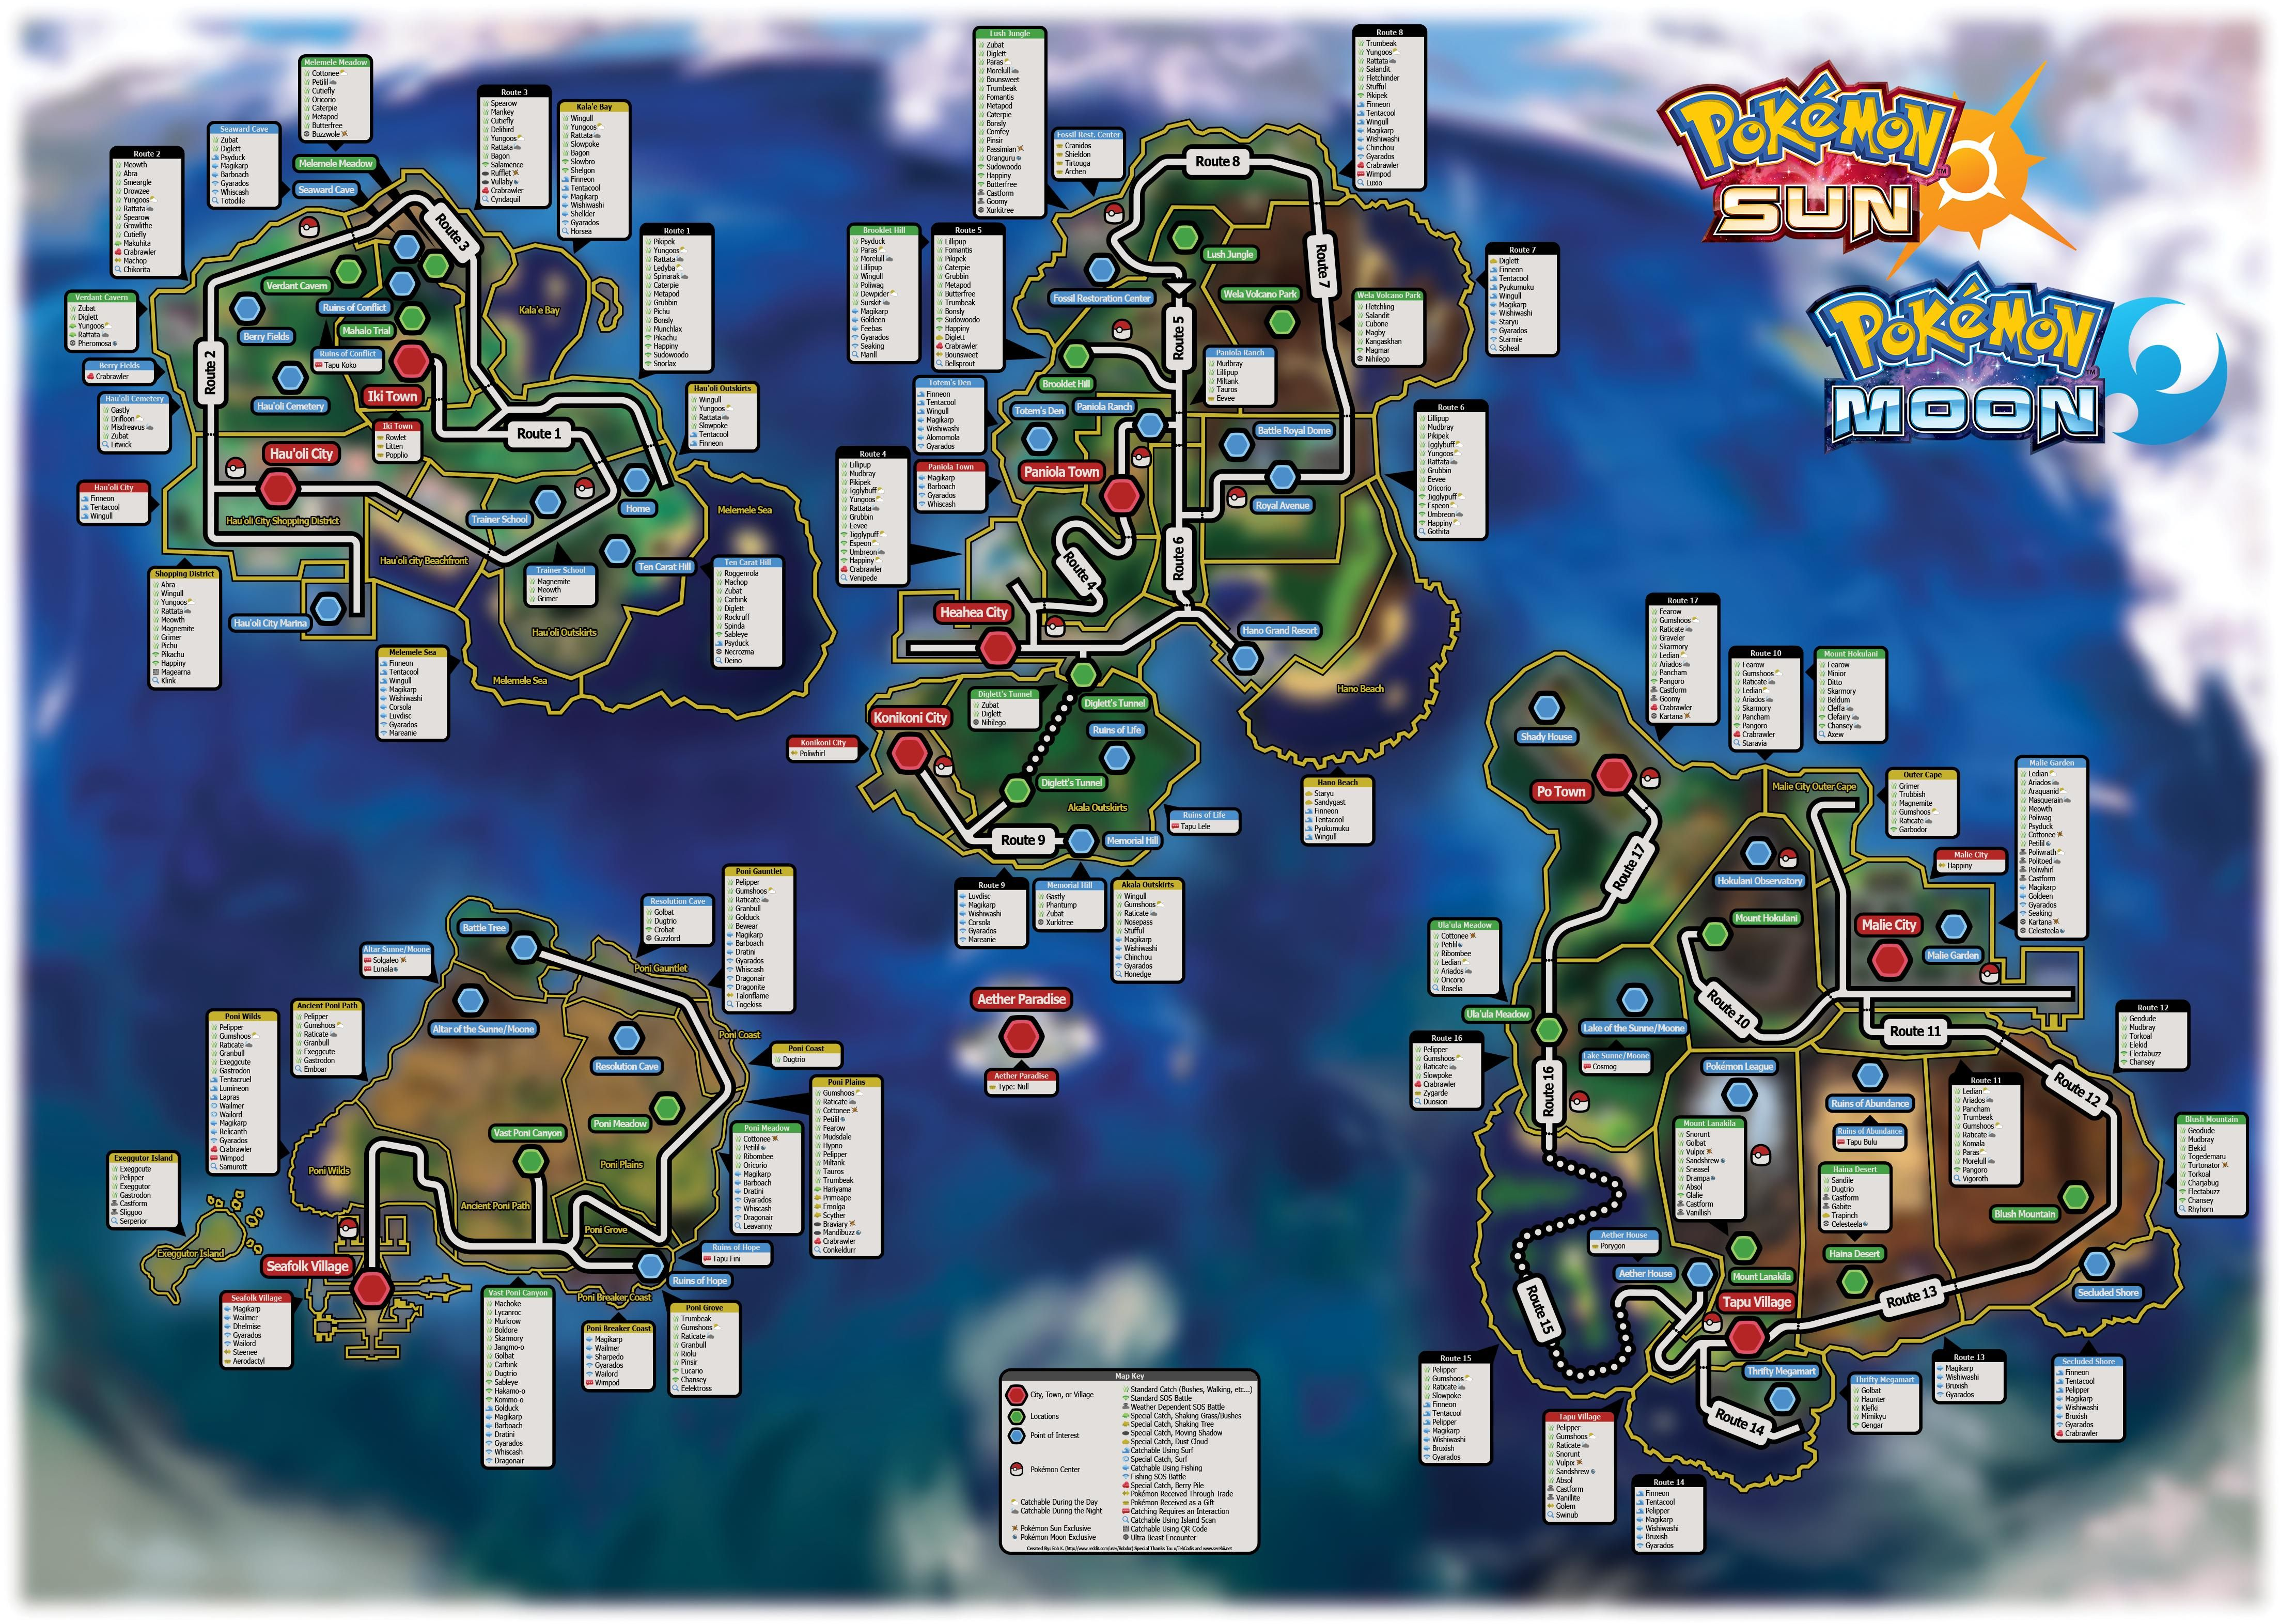 Pin by Sam Briskin on Pokemon Sun help | Pokemon, Pokemon 20 ... Sinnoh Map on karakura town map, yangtze river delta map, naruto world map, kingdom hearts world map, seafoam islands map, trans-pecos map, orre map, iowa great lakes map, eastern mediterranean map, southern mindanao map, battle frontier map, upper nile map, moosehead lake map, at&t regional map, afghanistan-pakistan border map, indo-pacific map, sub-saharan map, sevii islands map,